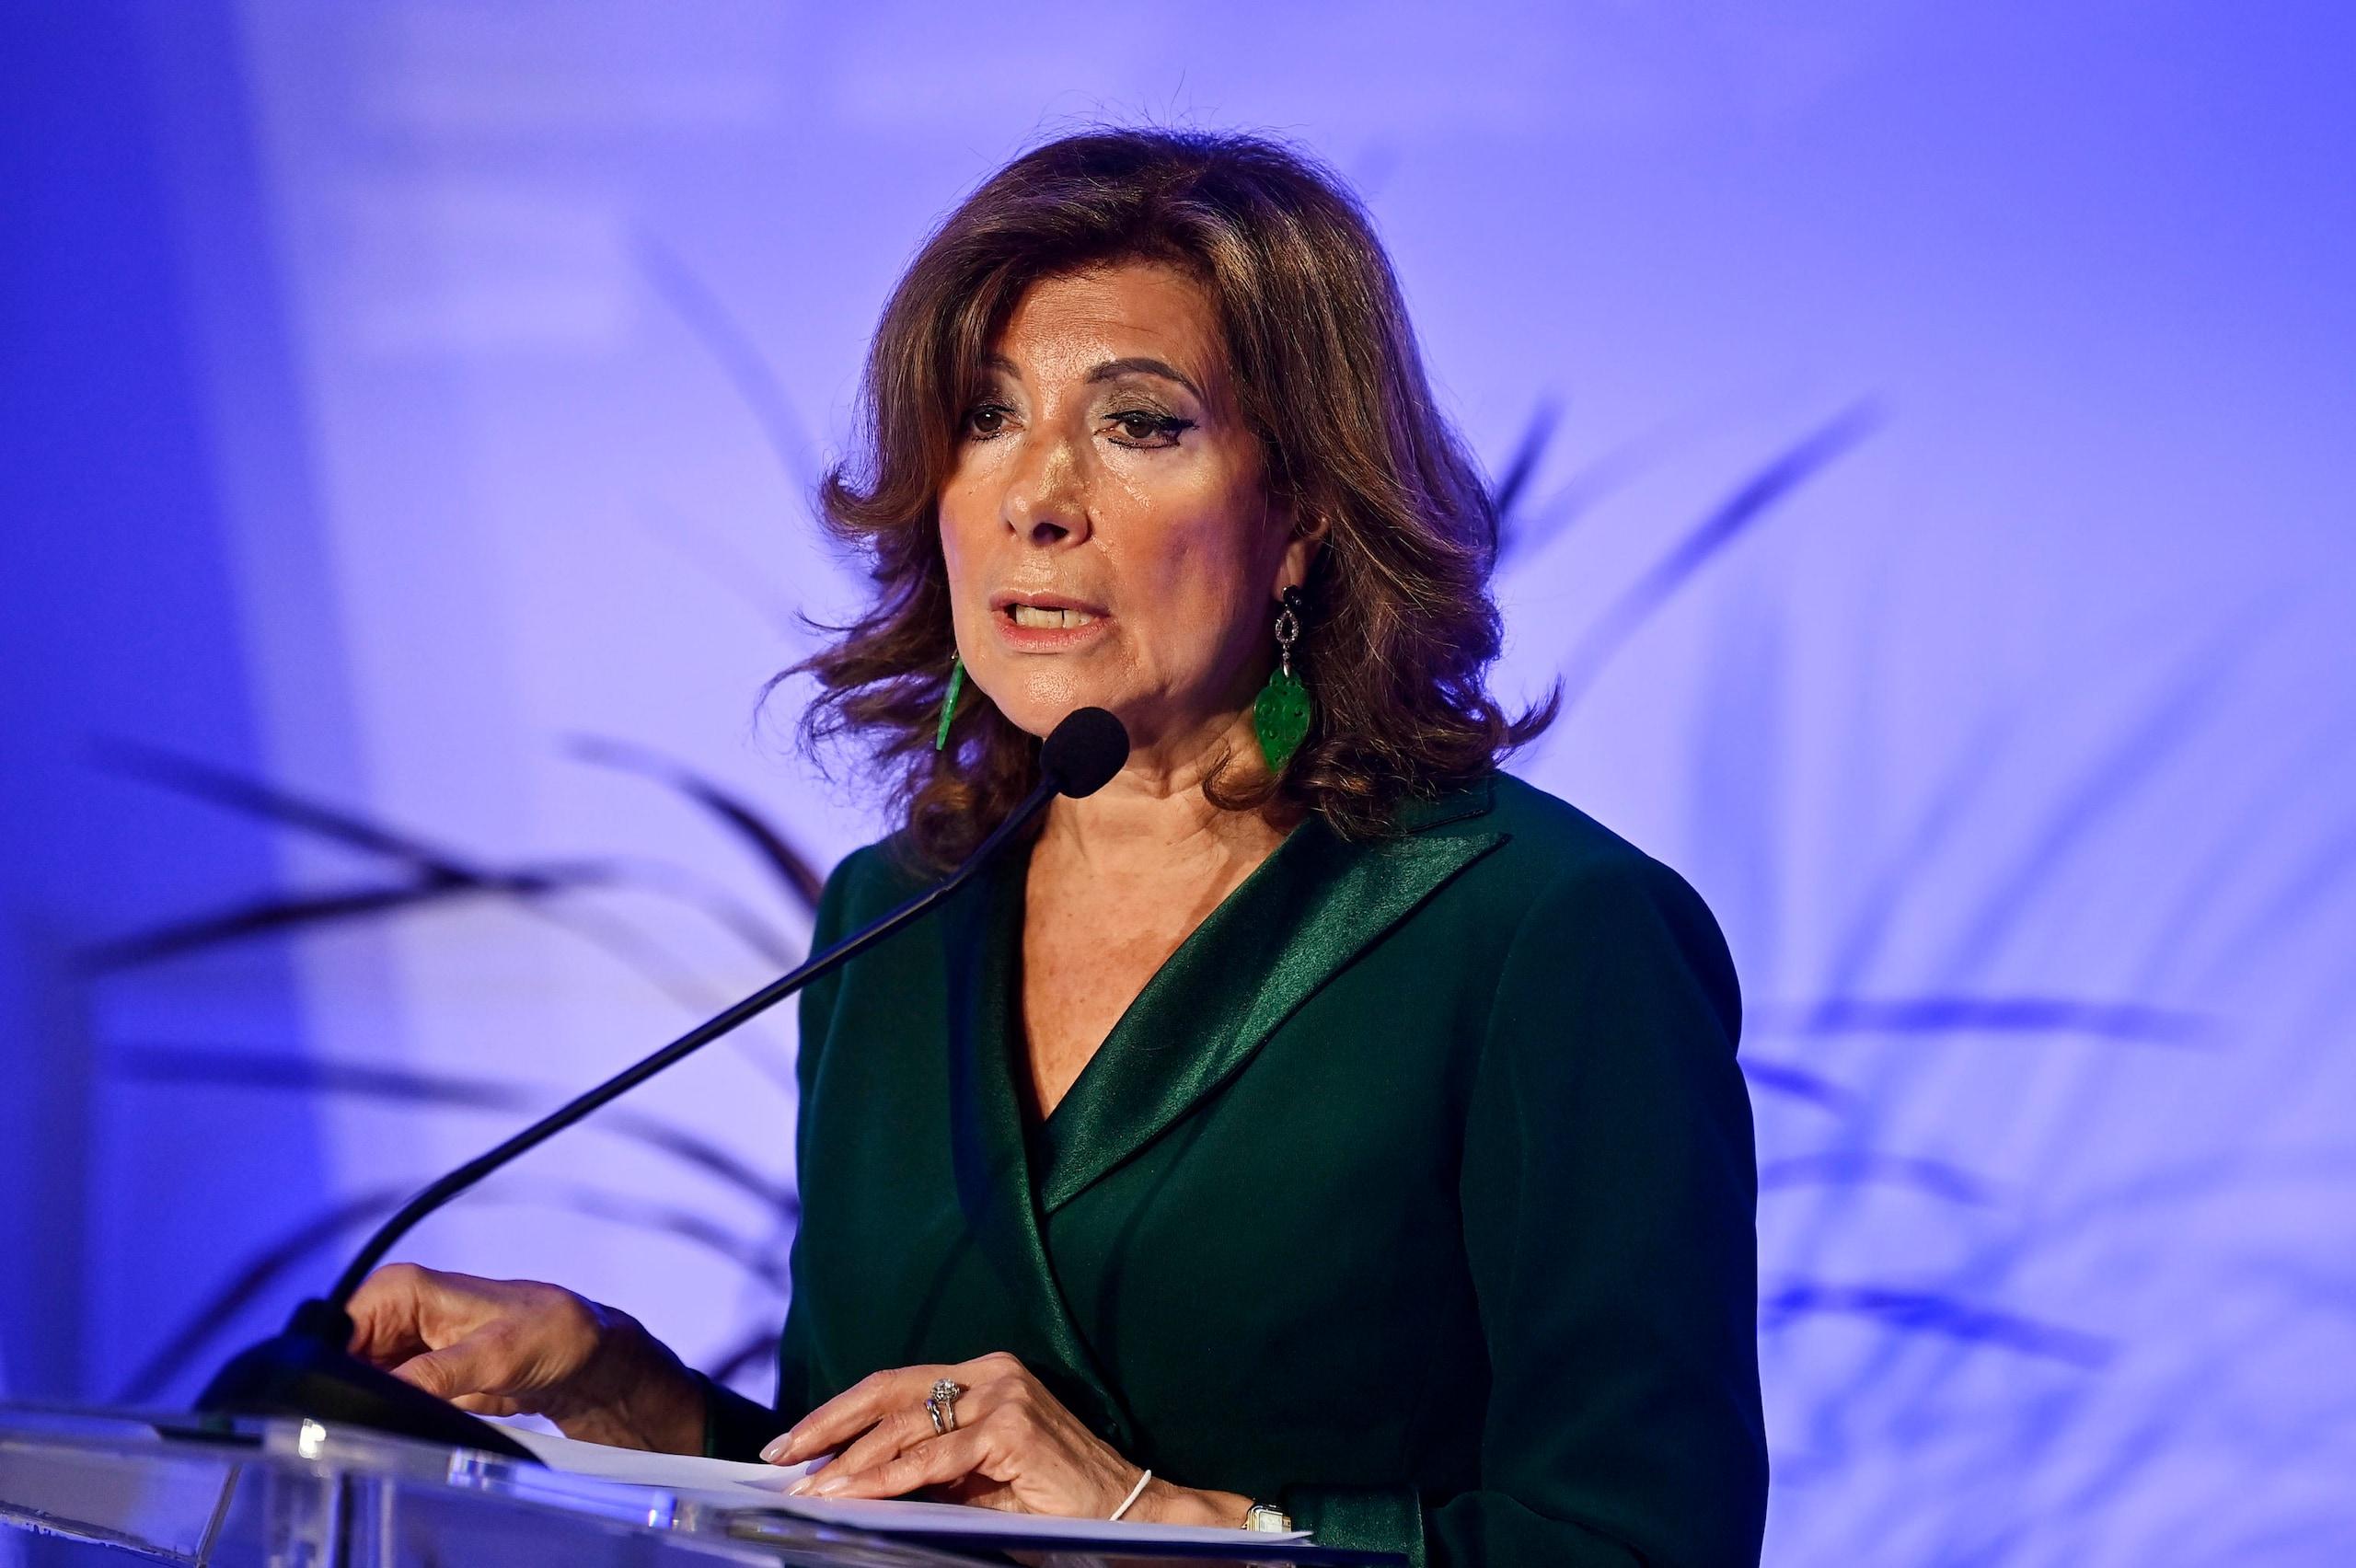 Violenza donne: Casellati, chi le teme le relega ai margini